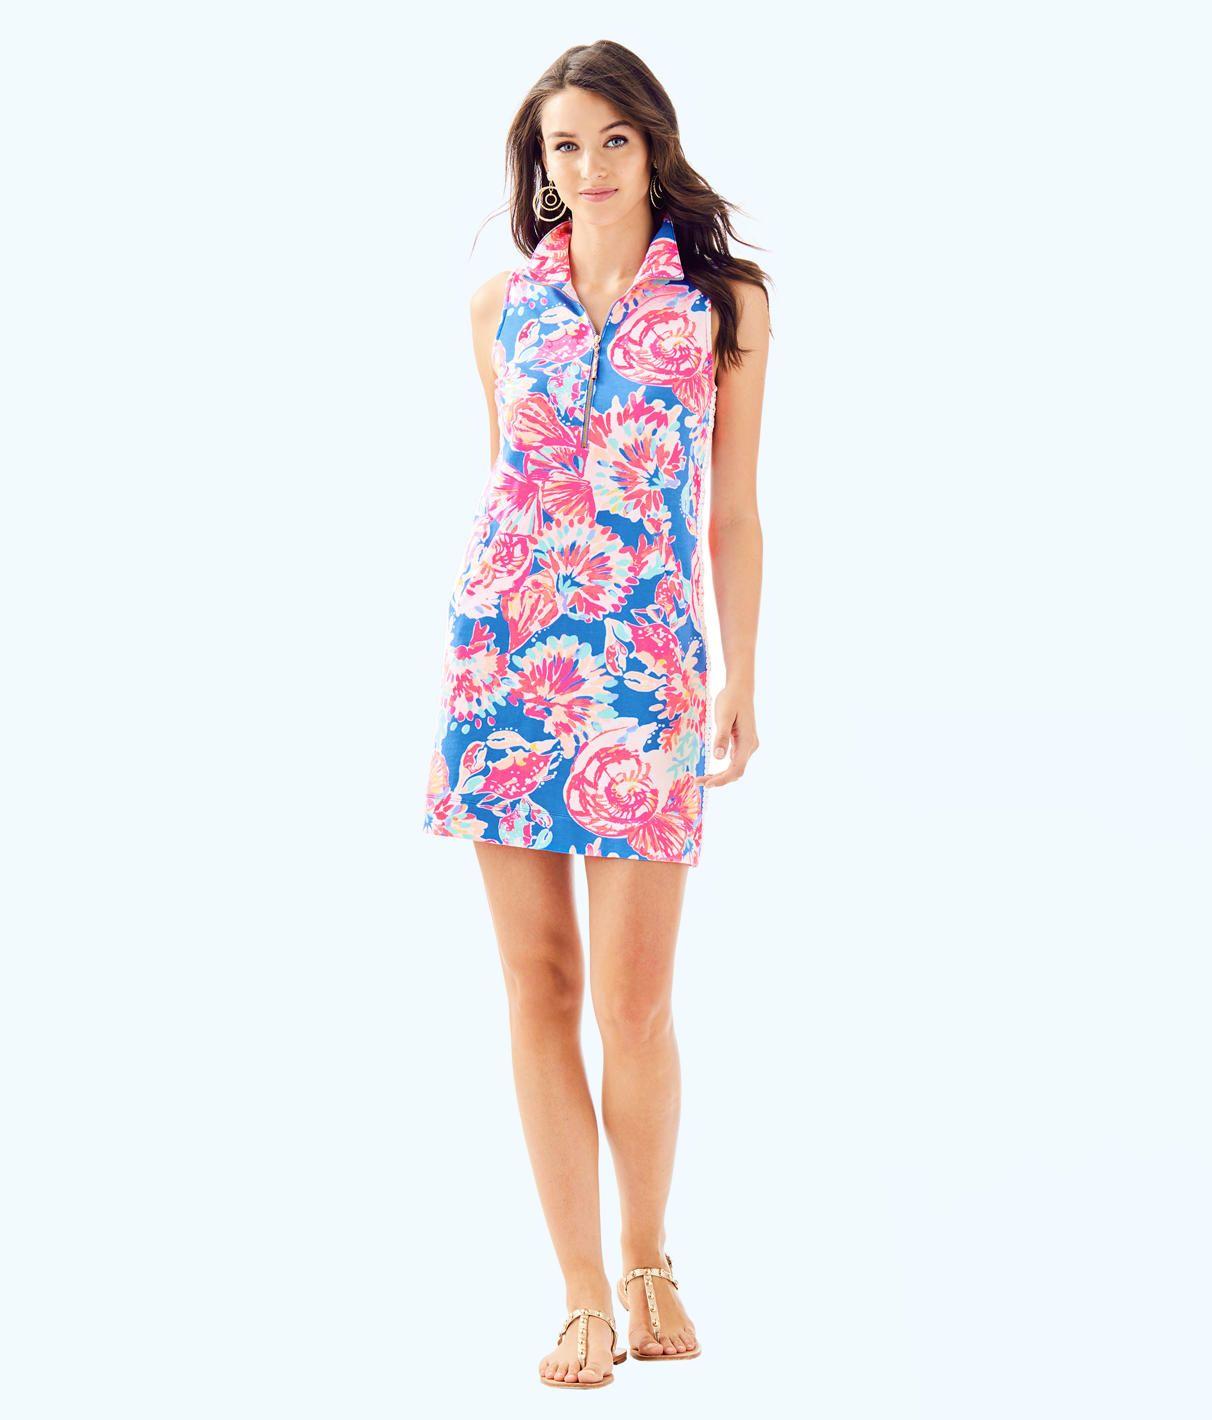 e266611a9aec38 Skipper Sleeveless Dress, Bennet Blue Bay Dreamin, large | Lilly ...